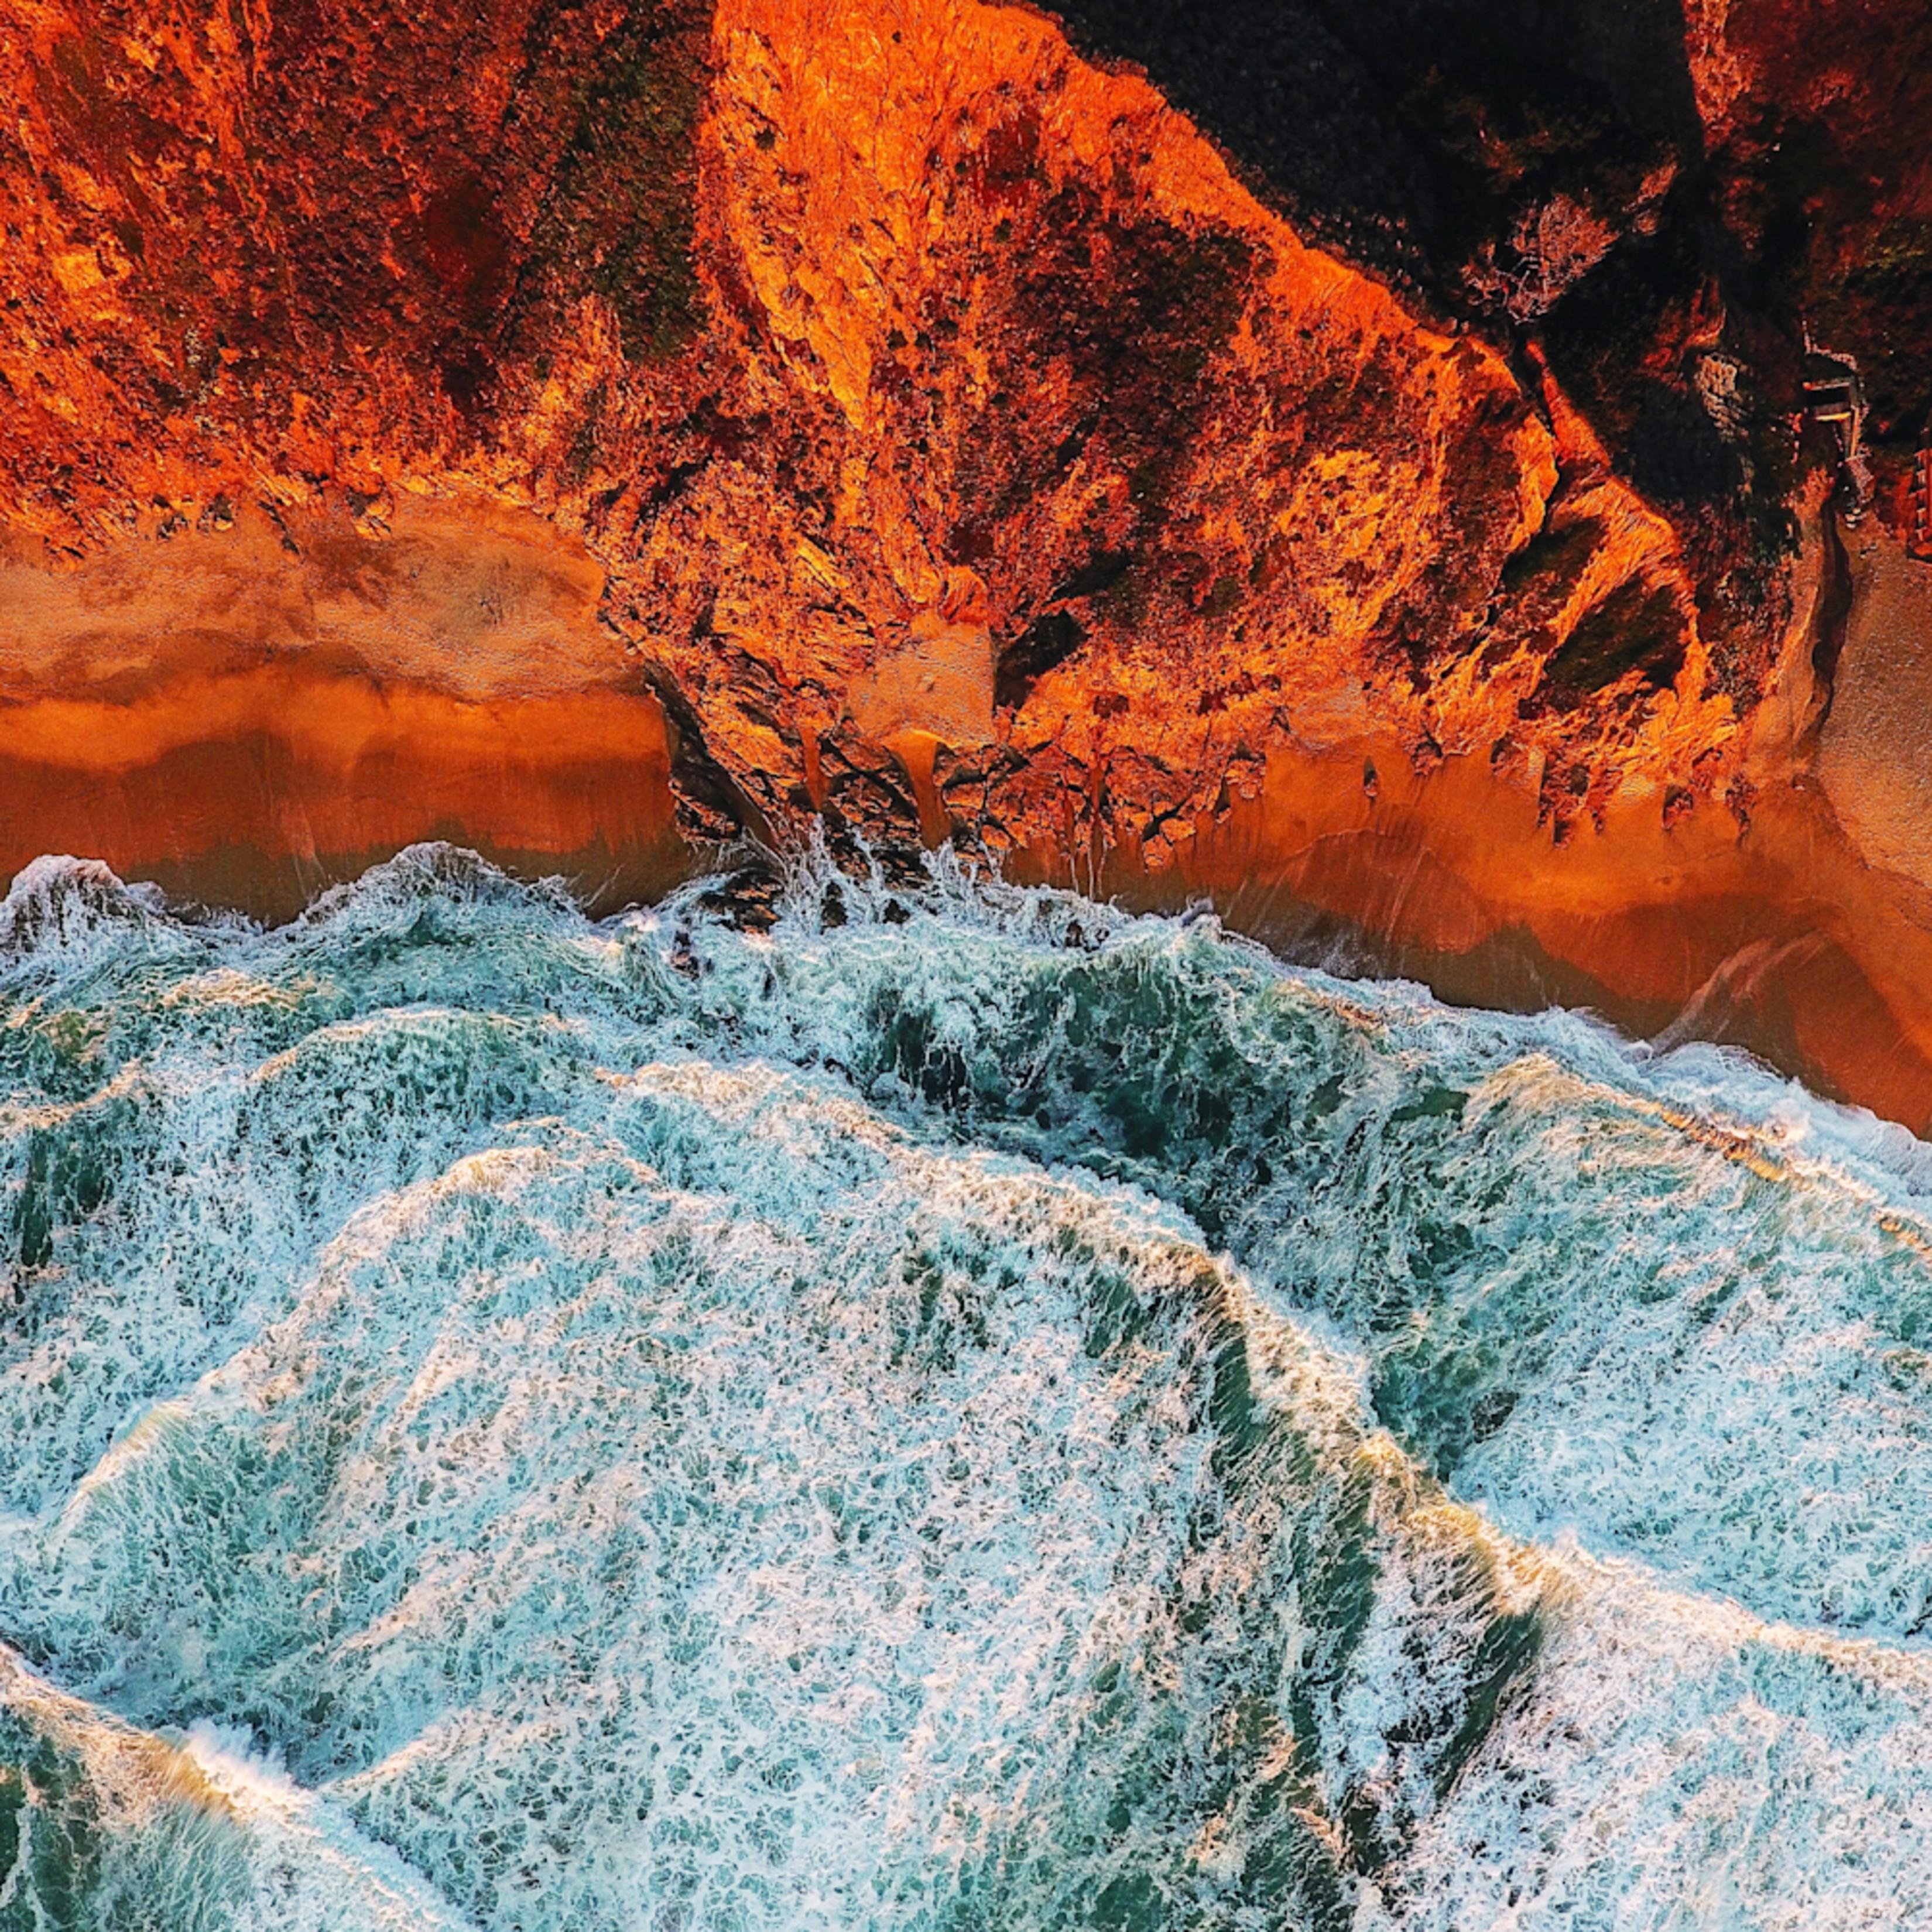 Mars beach 11x14 xej4qx